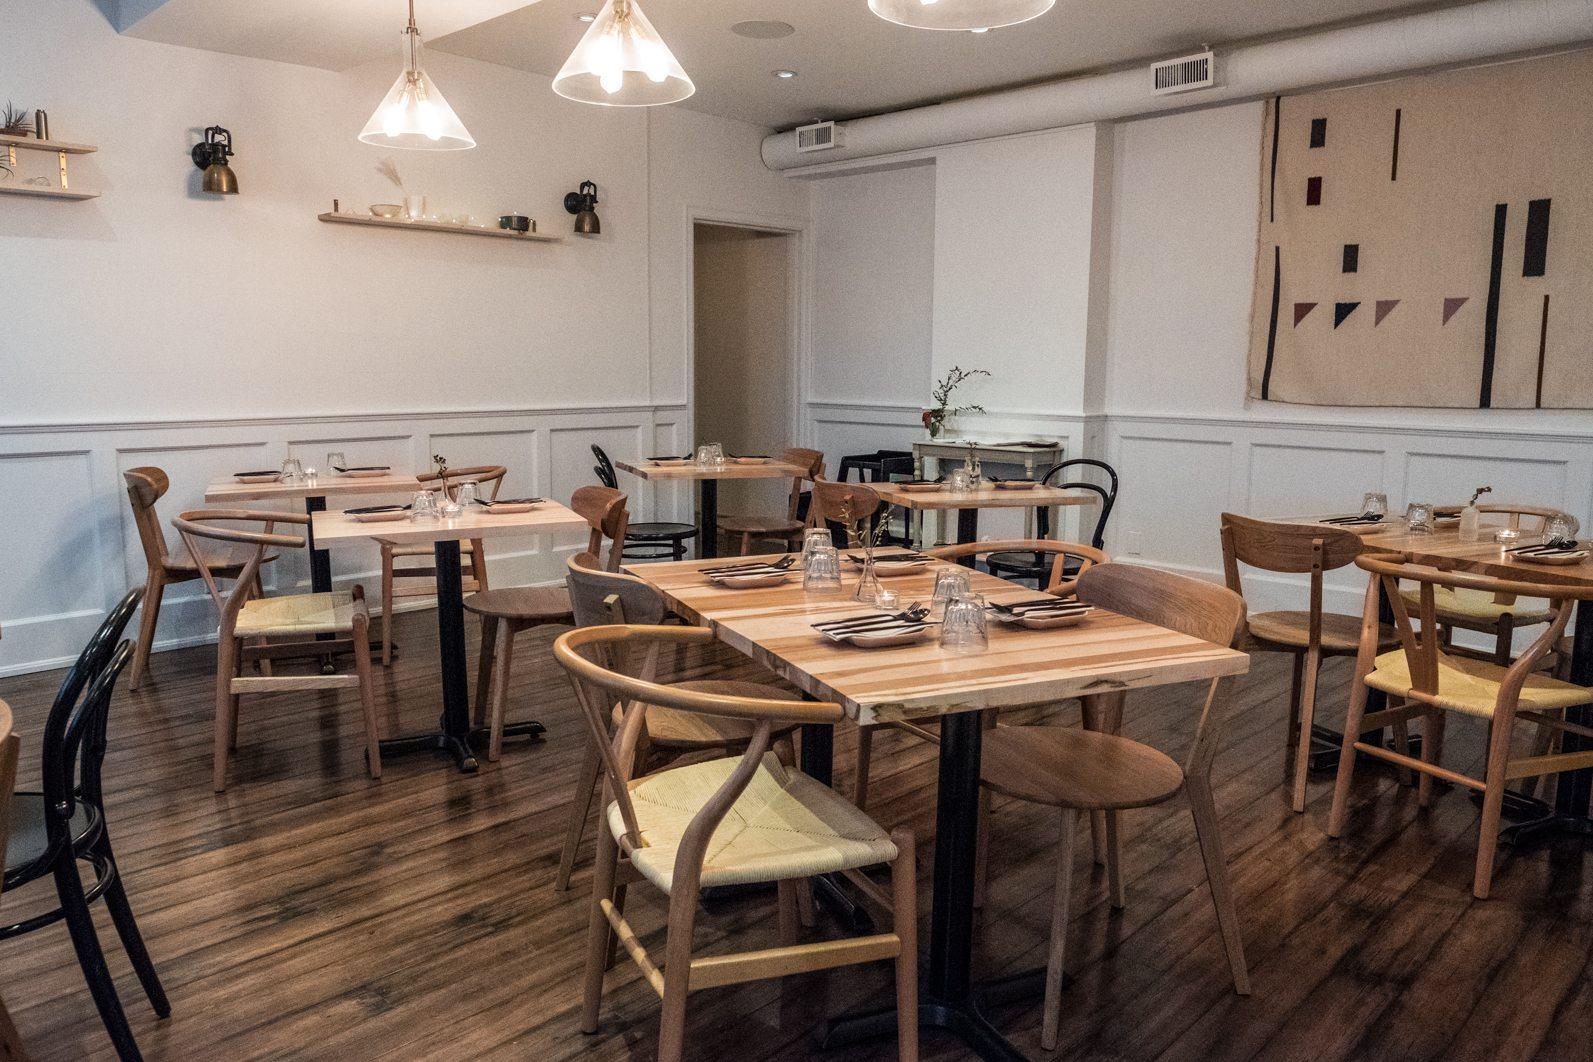 toronto-restaurants-doma-korean-french-little-italy-dining-room-2